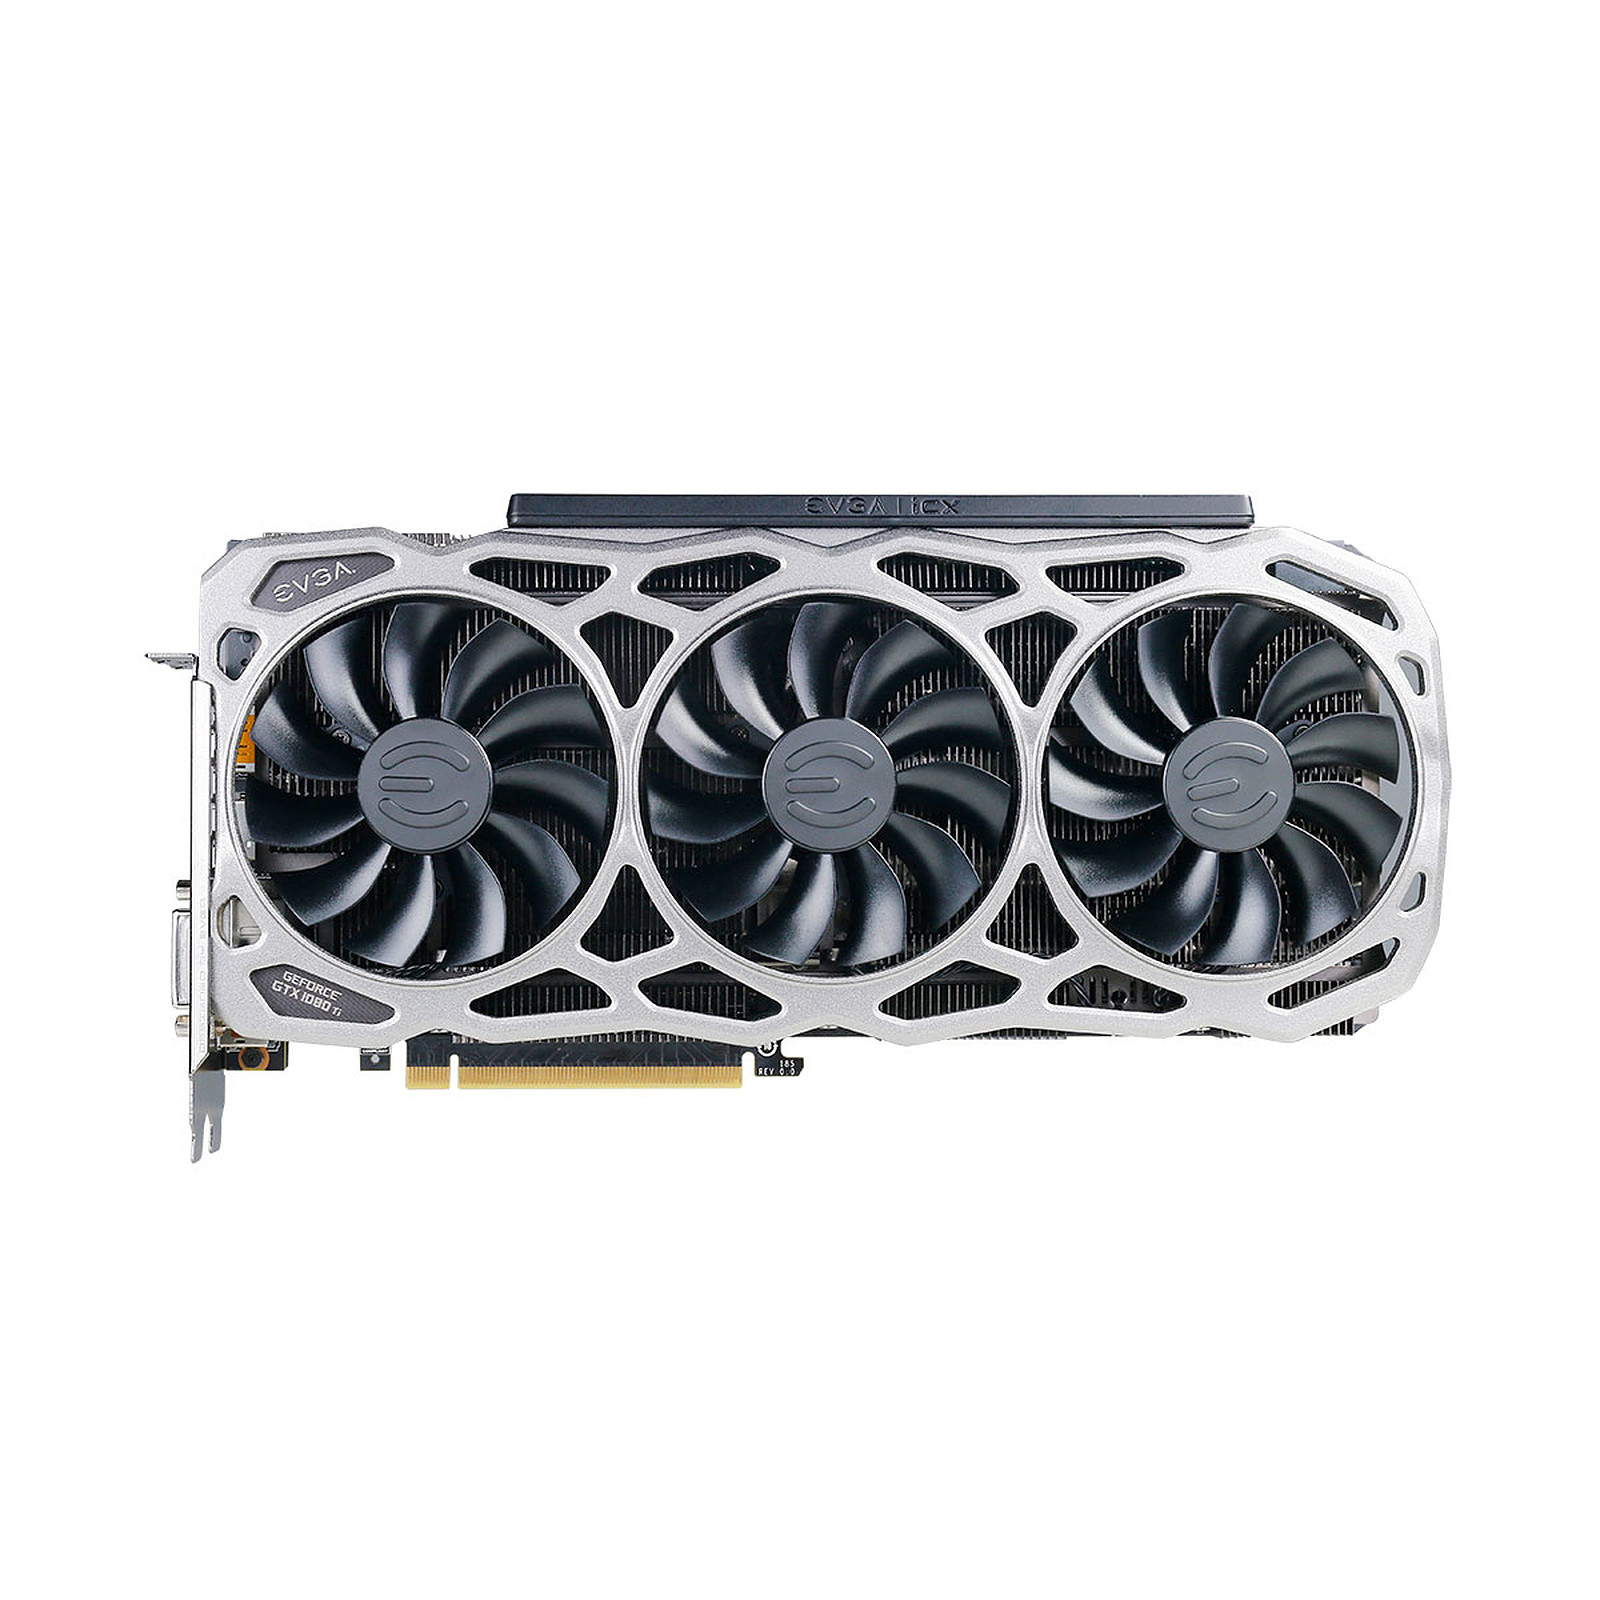 EVGA GeForce GTX 1080 Ti FTW3 GAMING ICX - Carte graphique